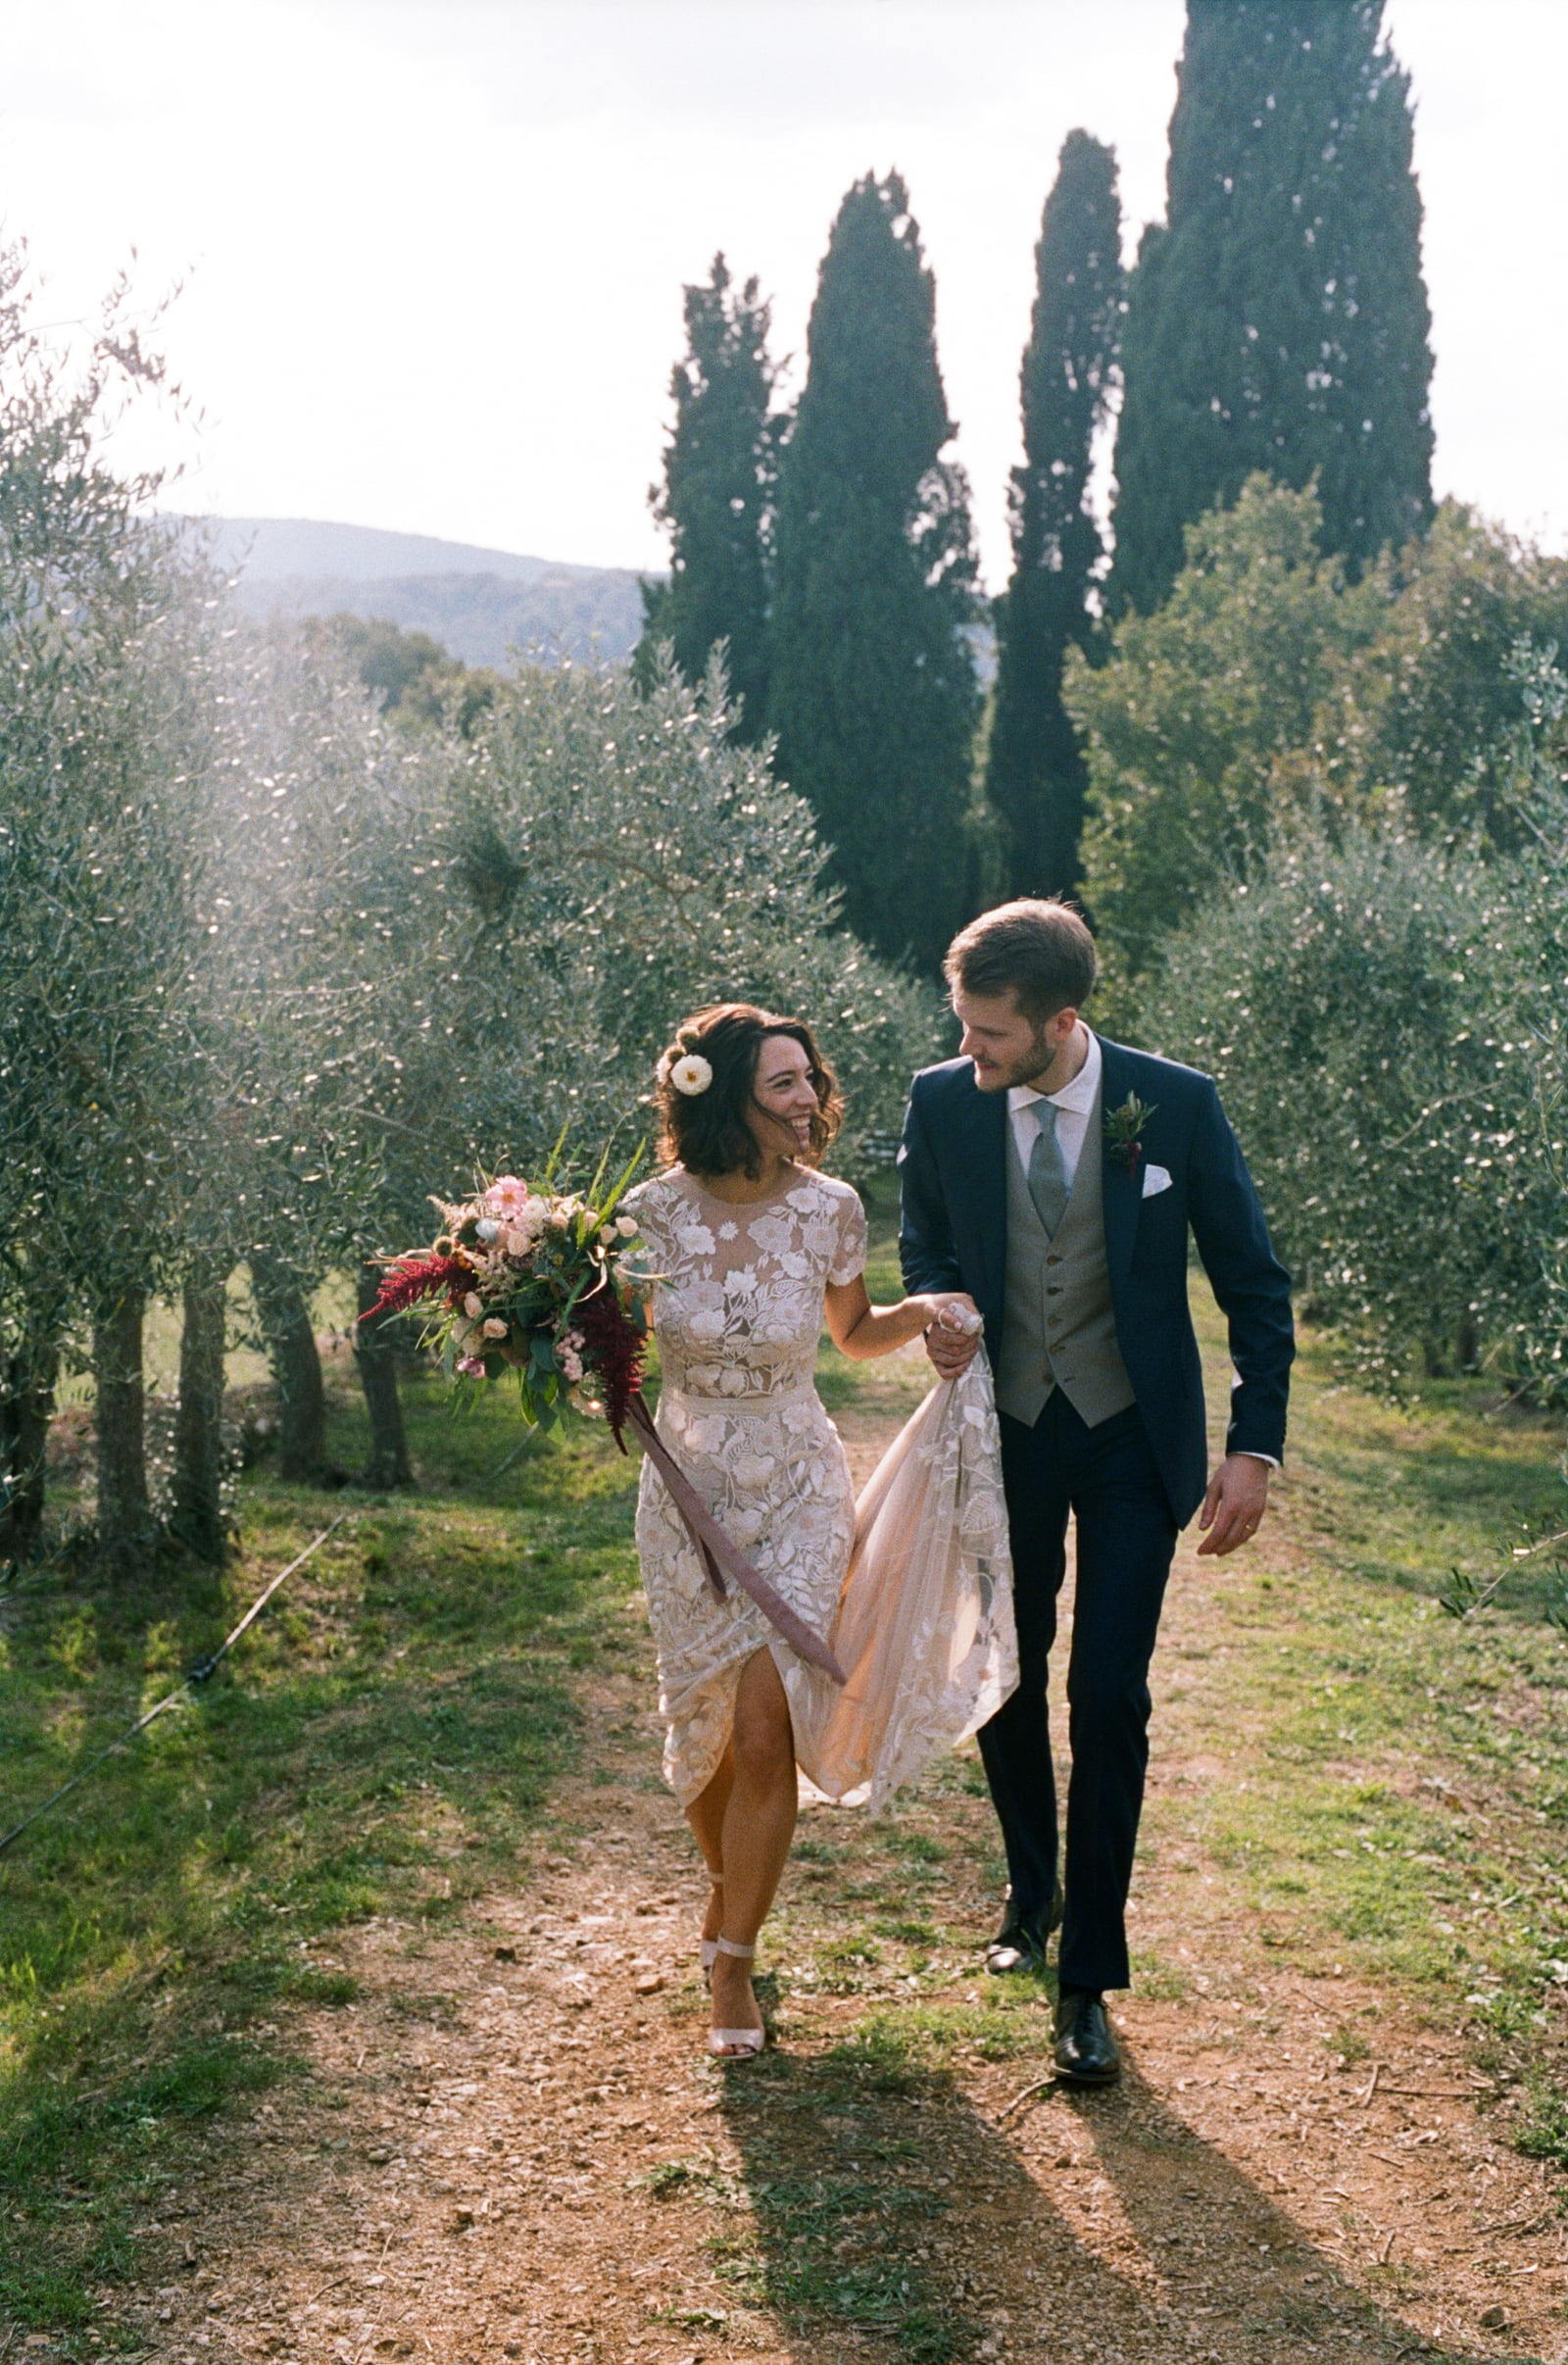 wedding in the countryside in monteriggioni siena